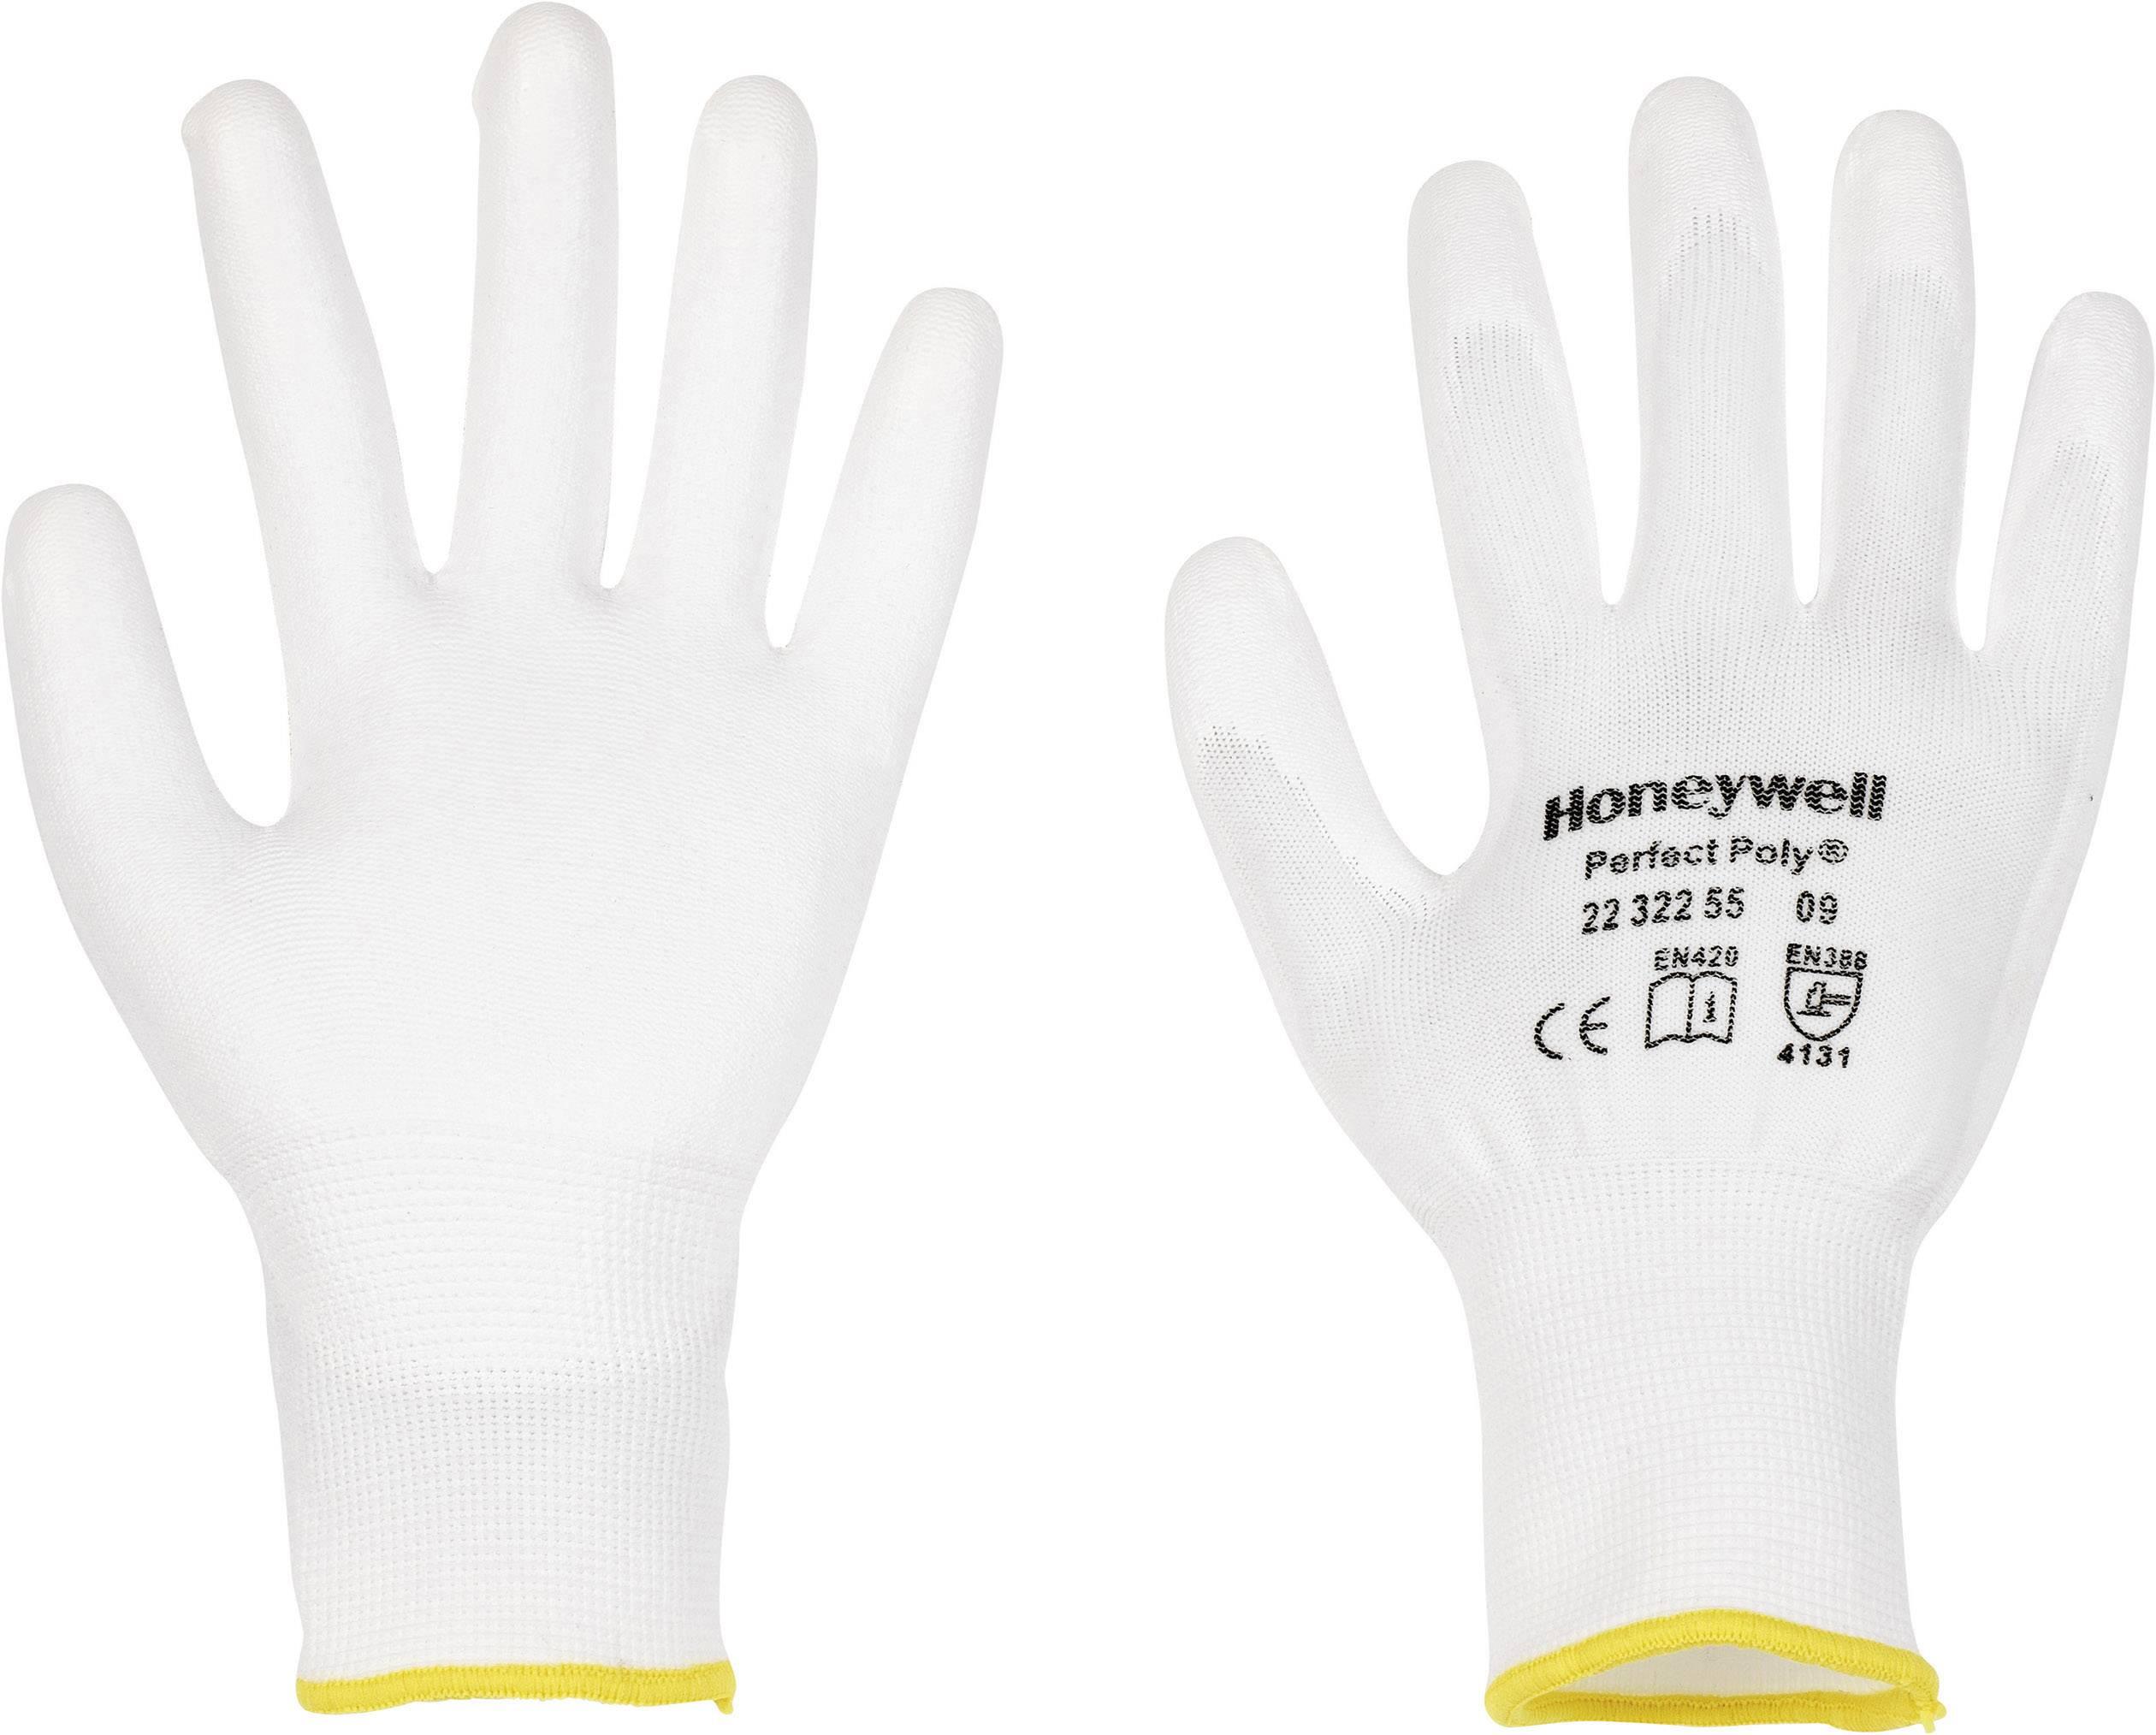 Pracovné rukavice Perfect Fit GANTS BLANCS PERFECTPOLY 2232255, velikost rukavic: 8, M